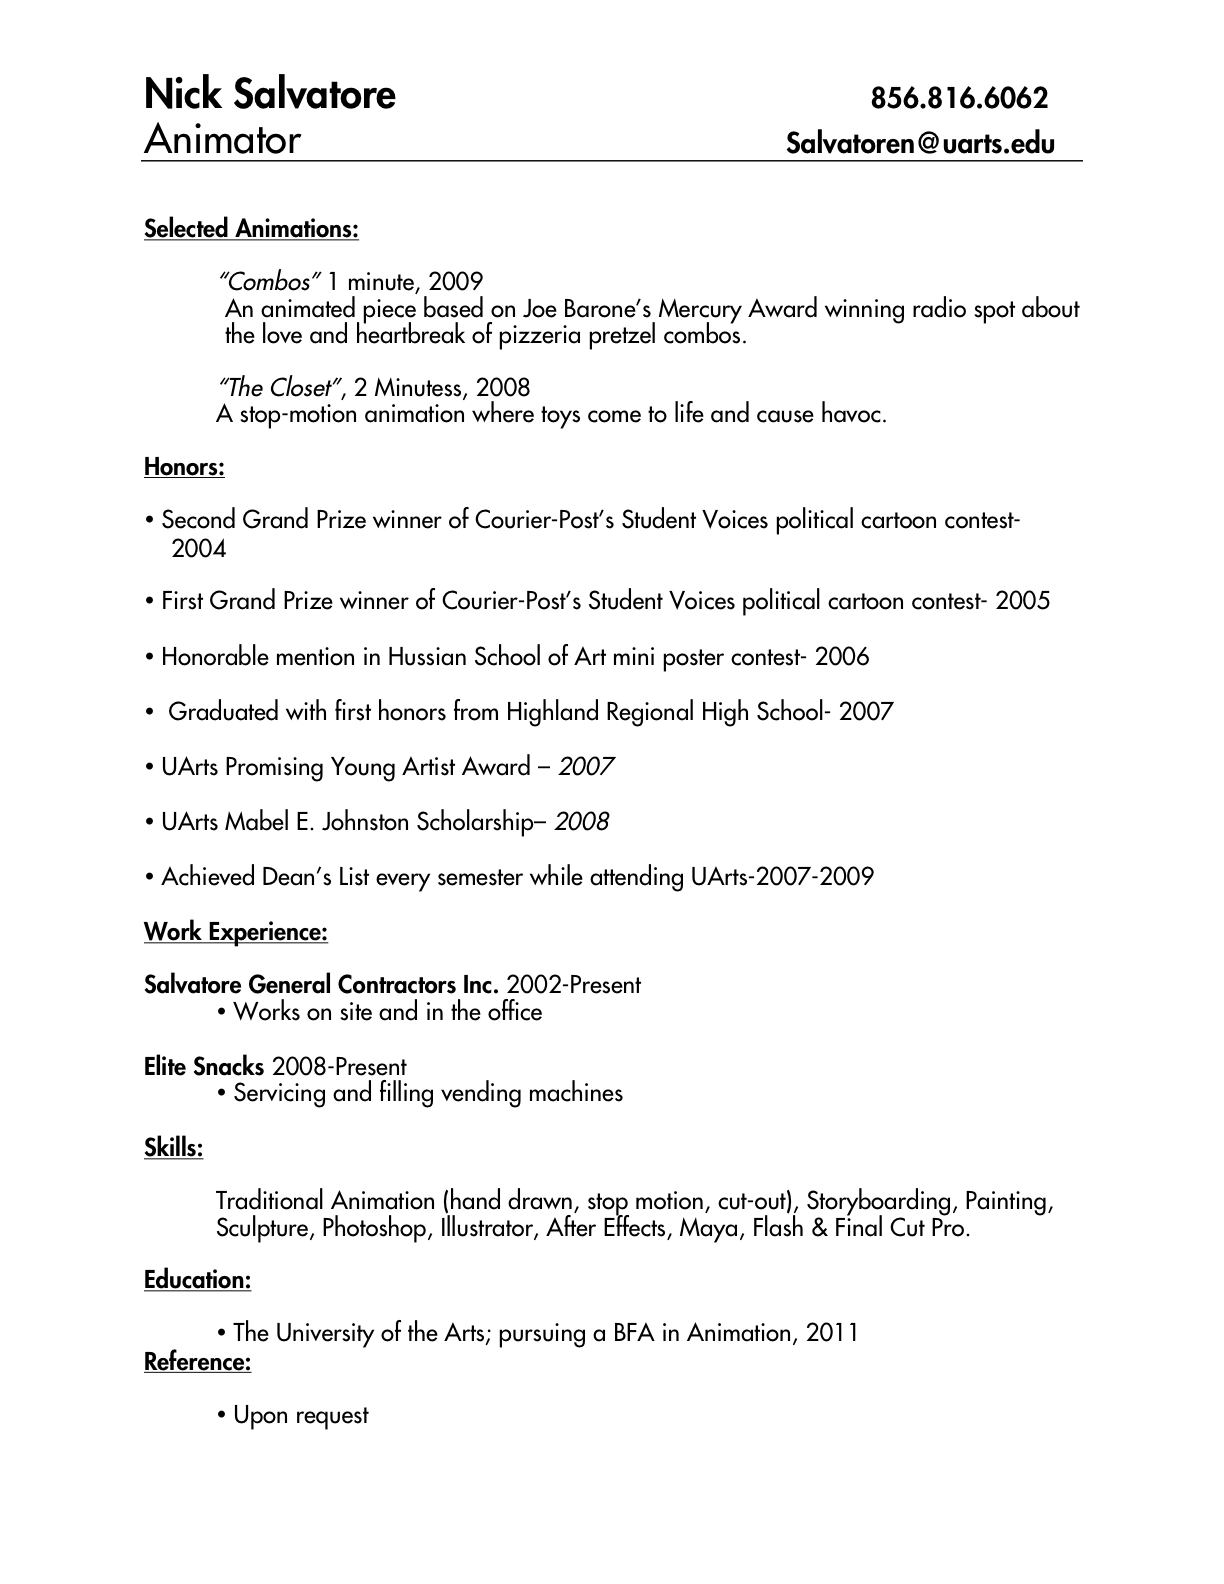 Resume Creation. resume resume templates amp online resume builder ...